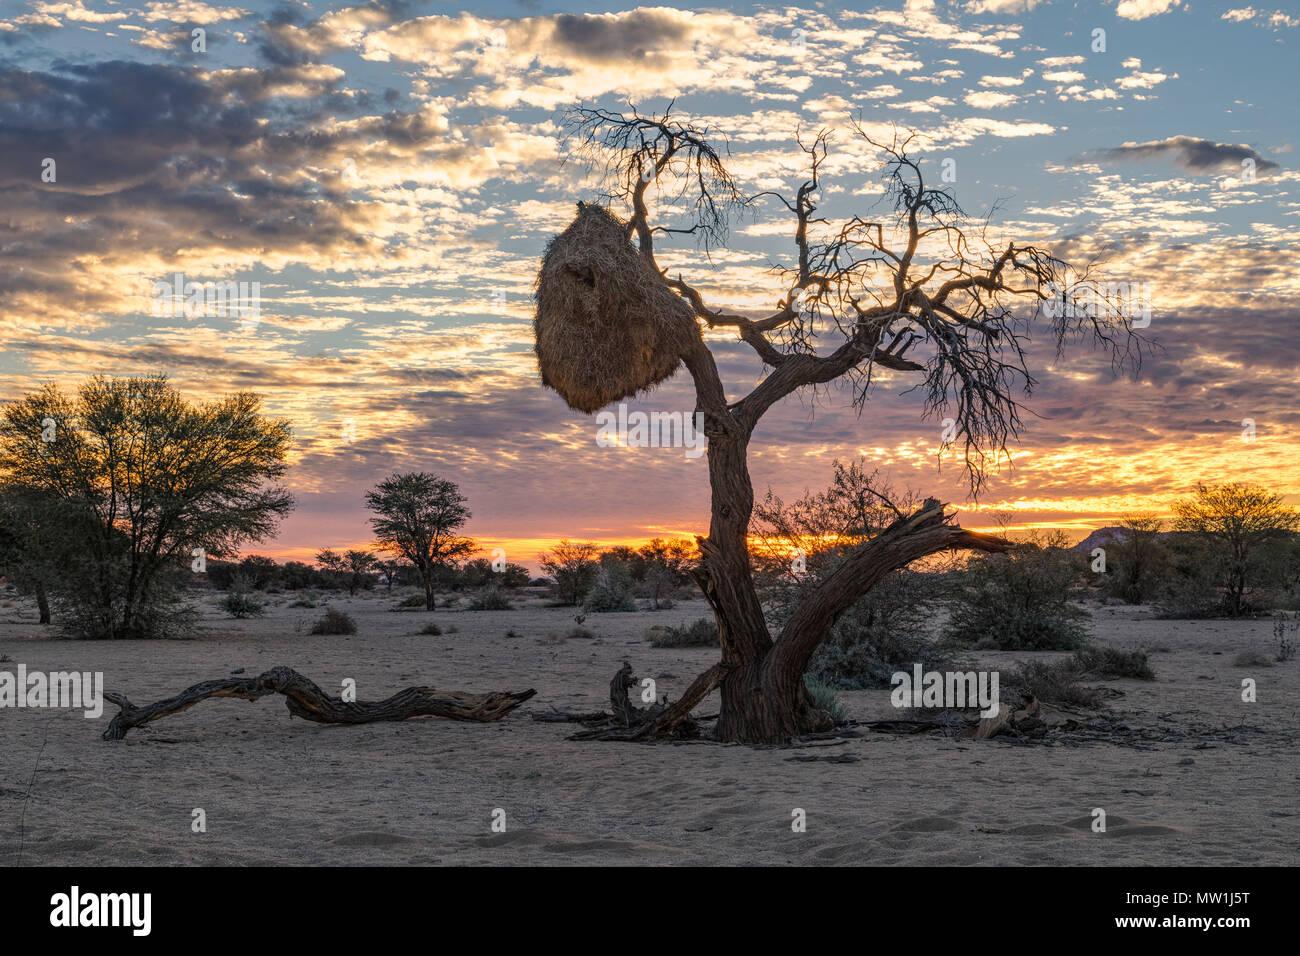 Aus, Namibia, Africa - Stock Image